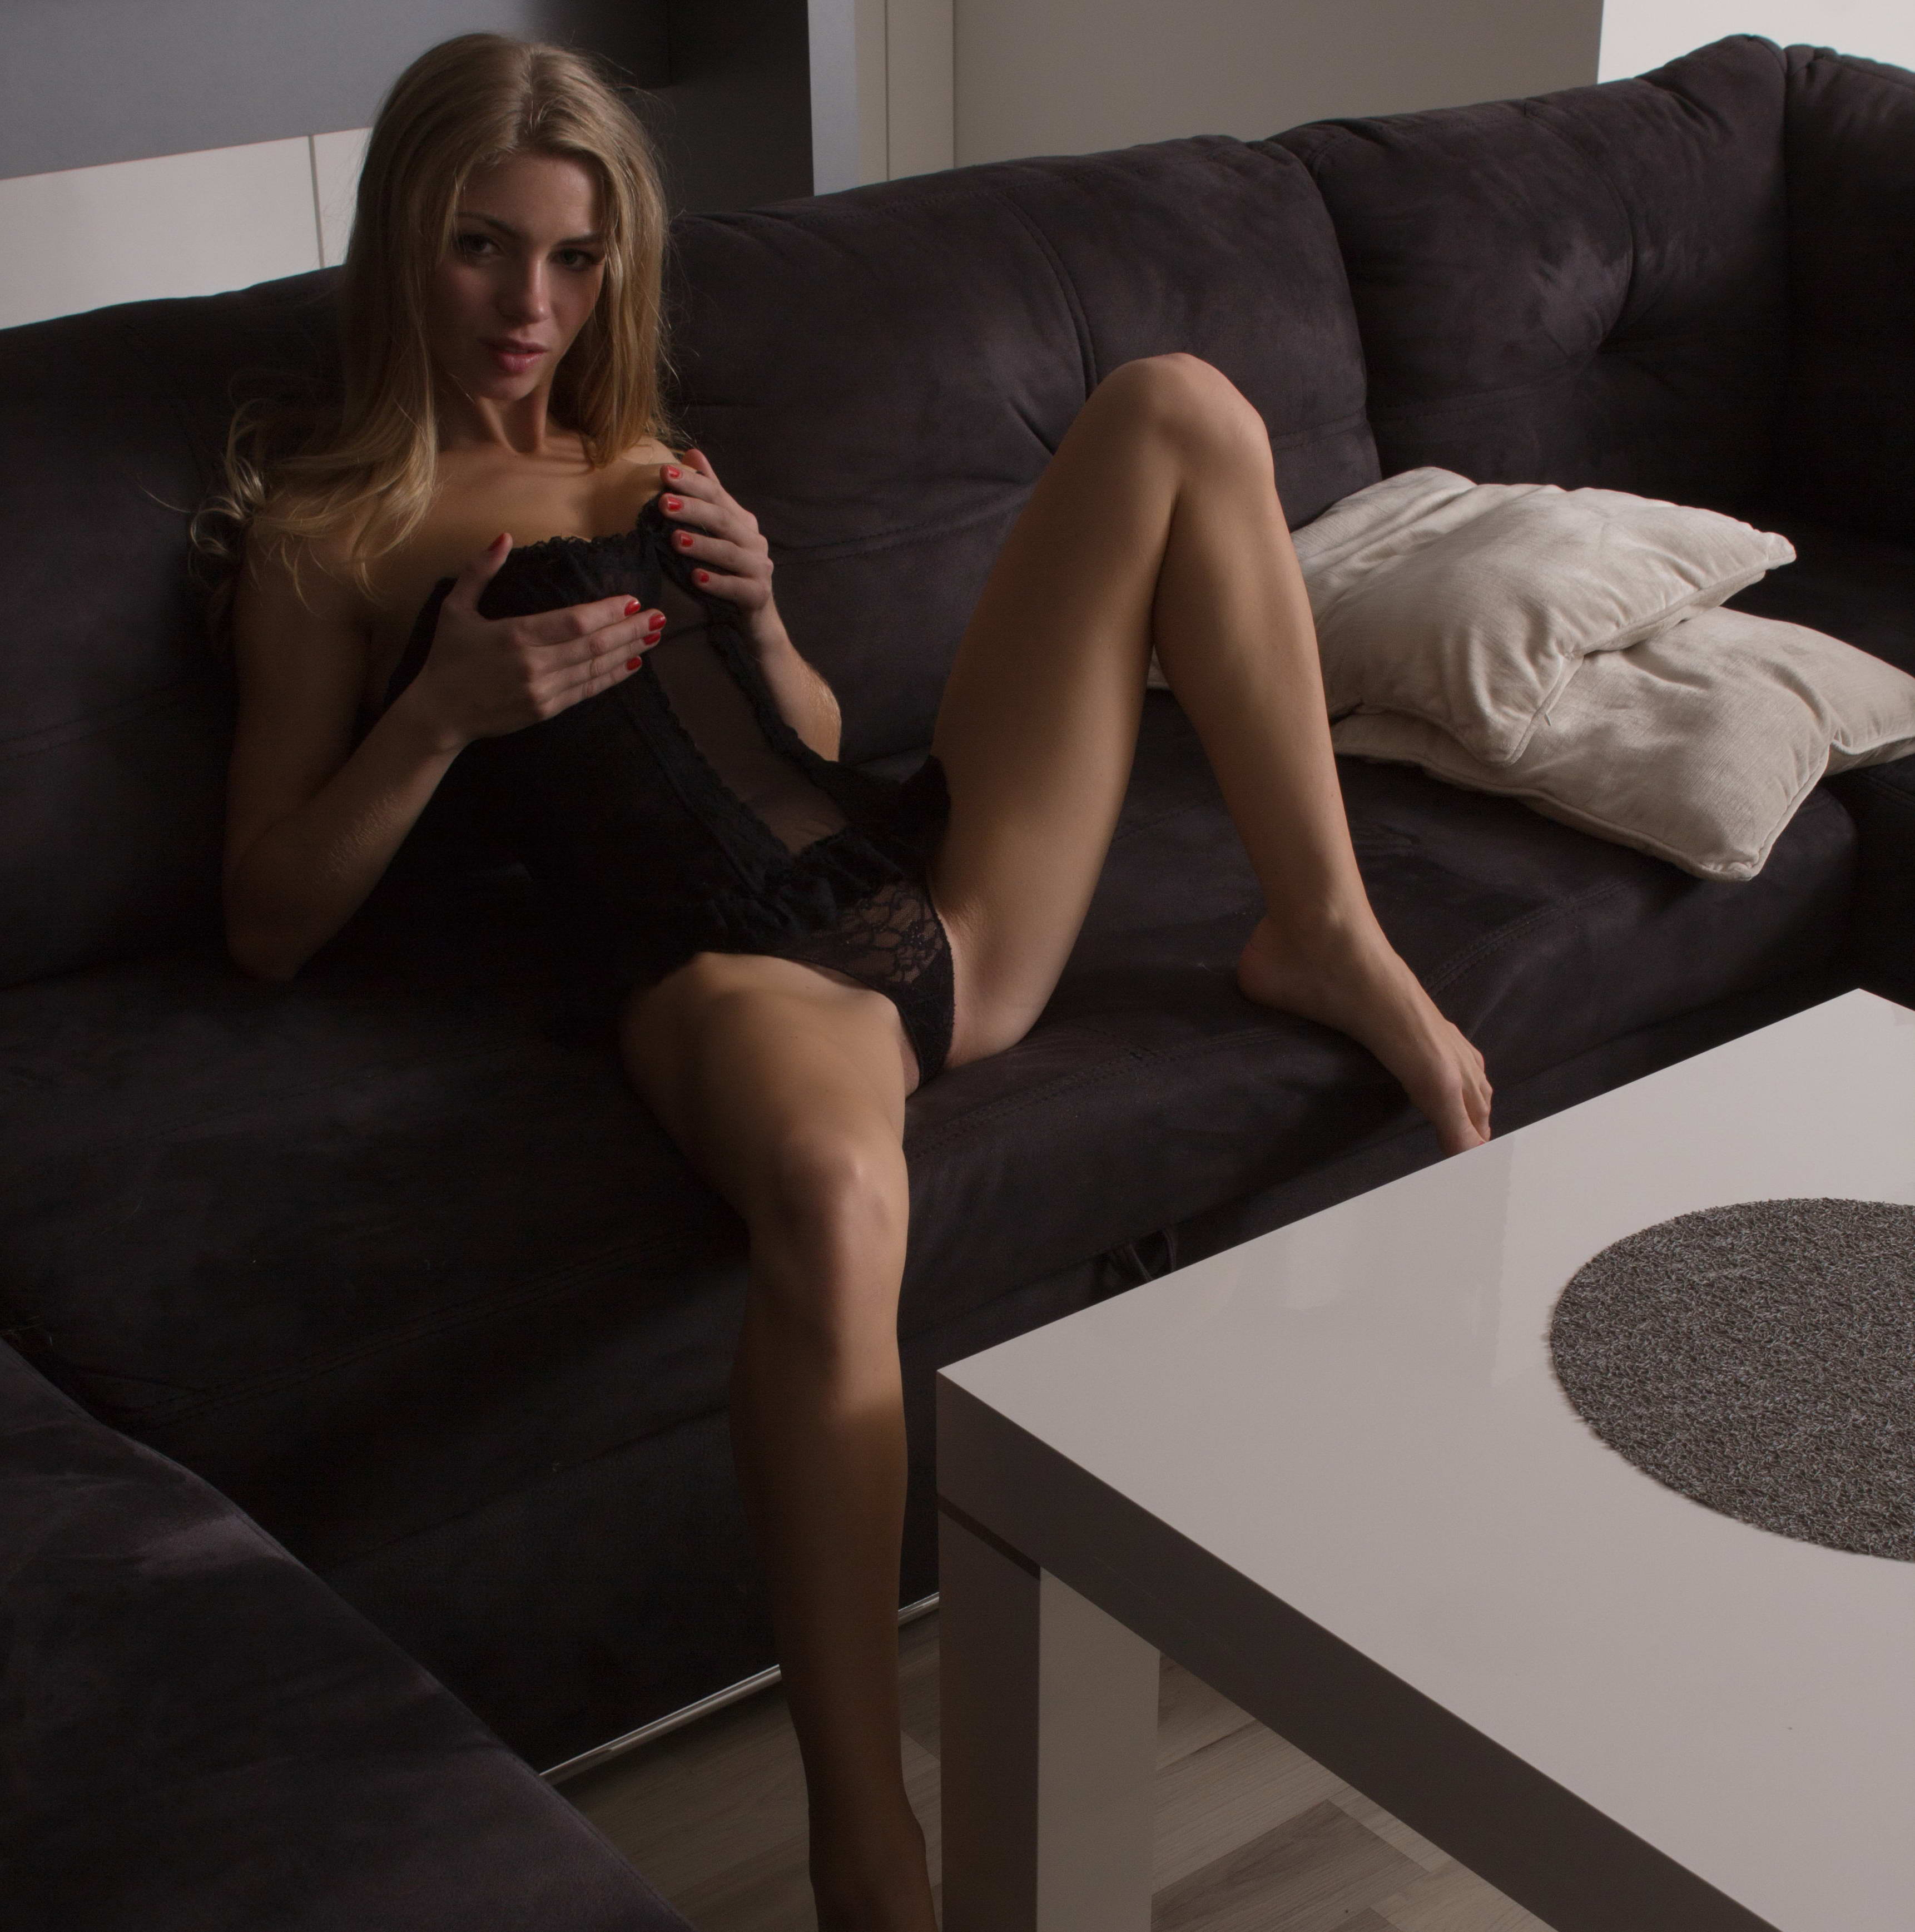 Pretty Girl With Pretty Legs